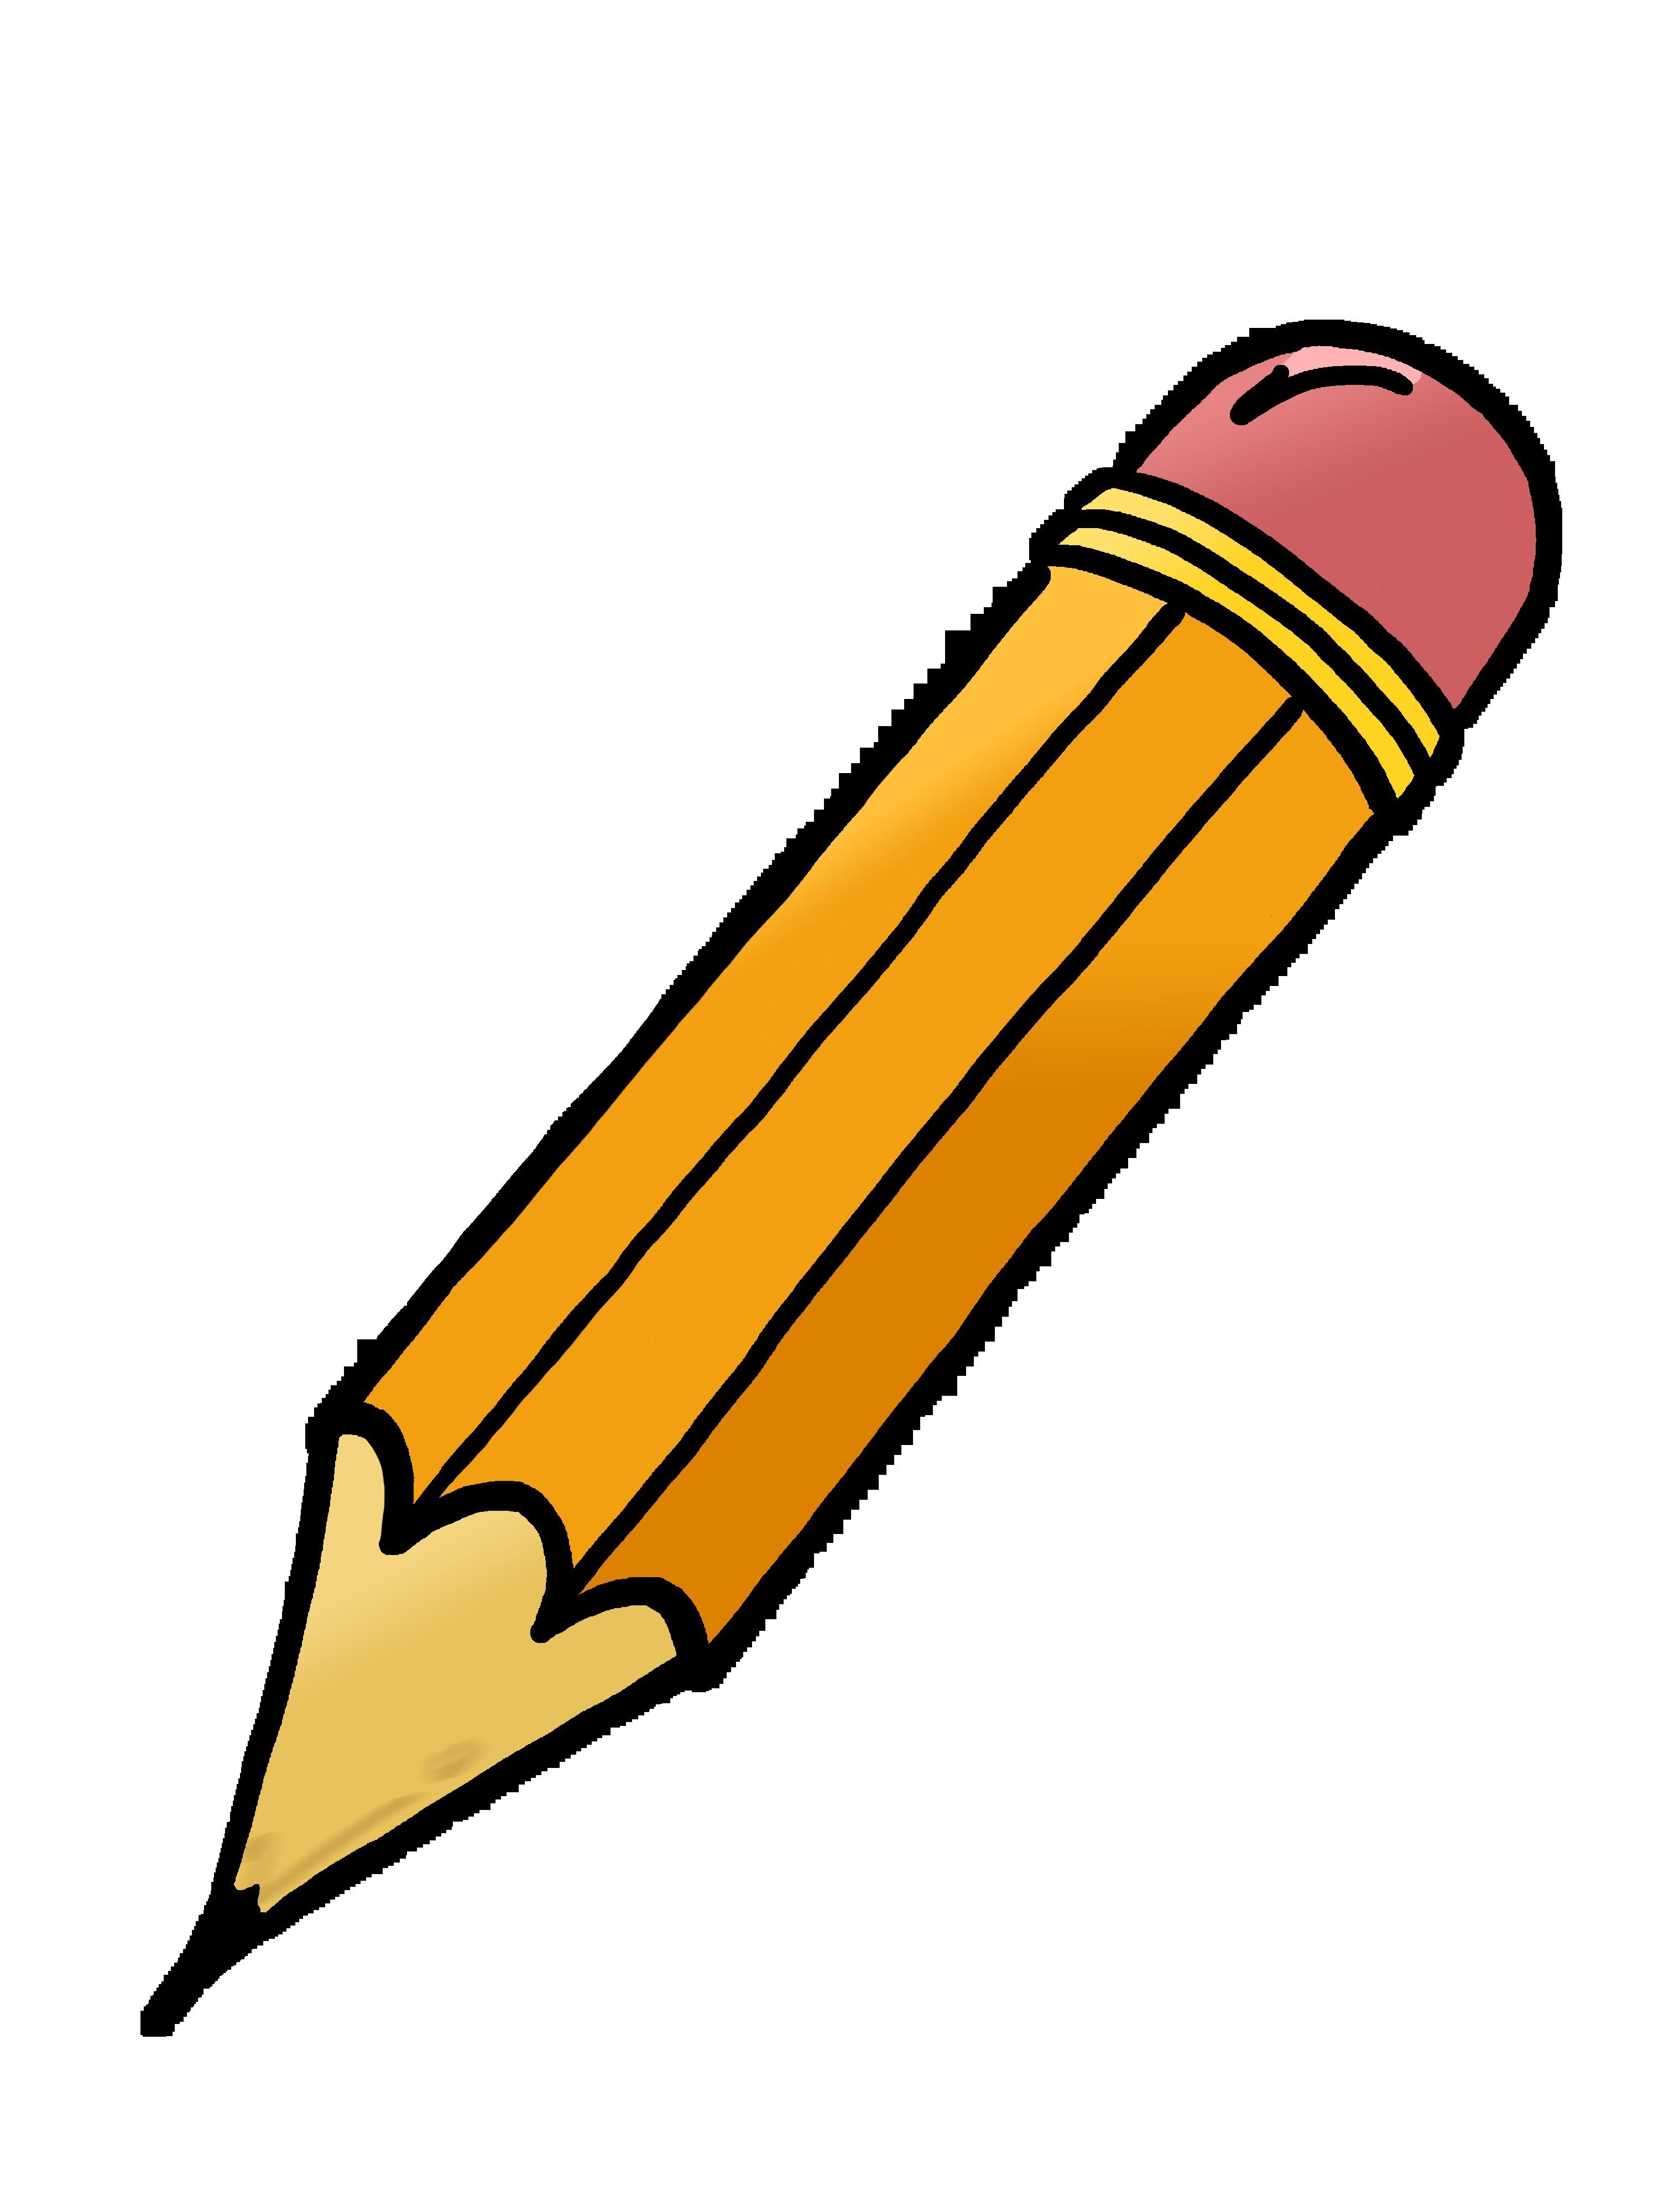 Clipart pencil. Animation incep imagine ex